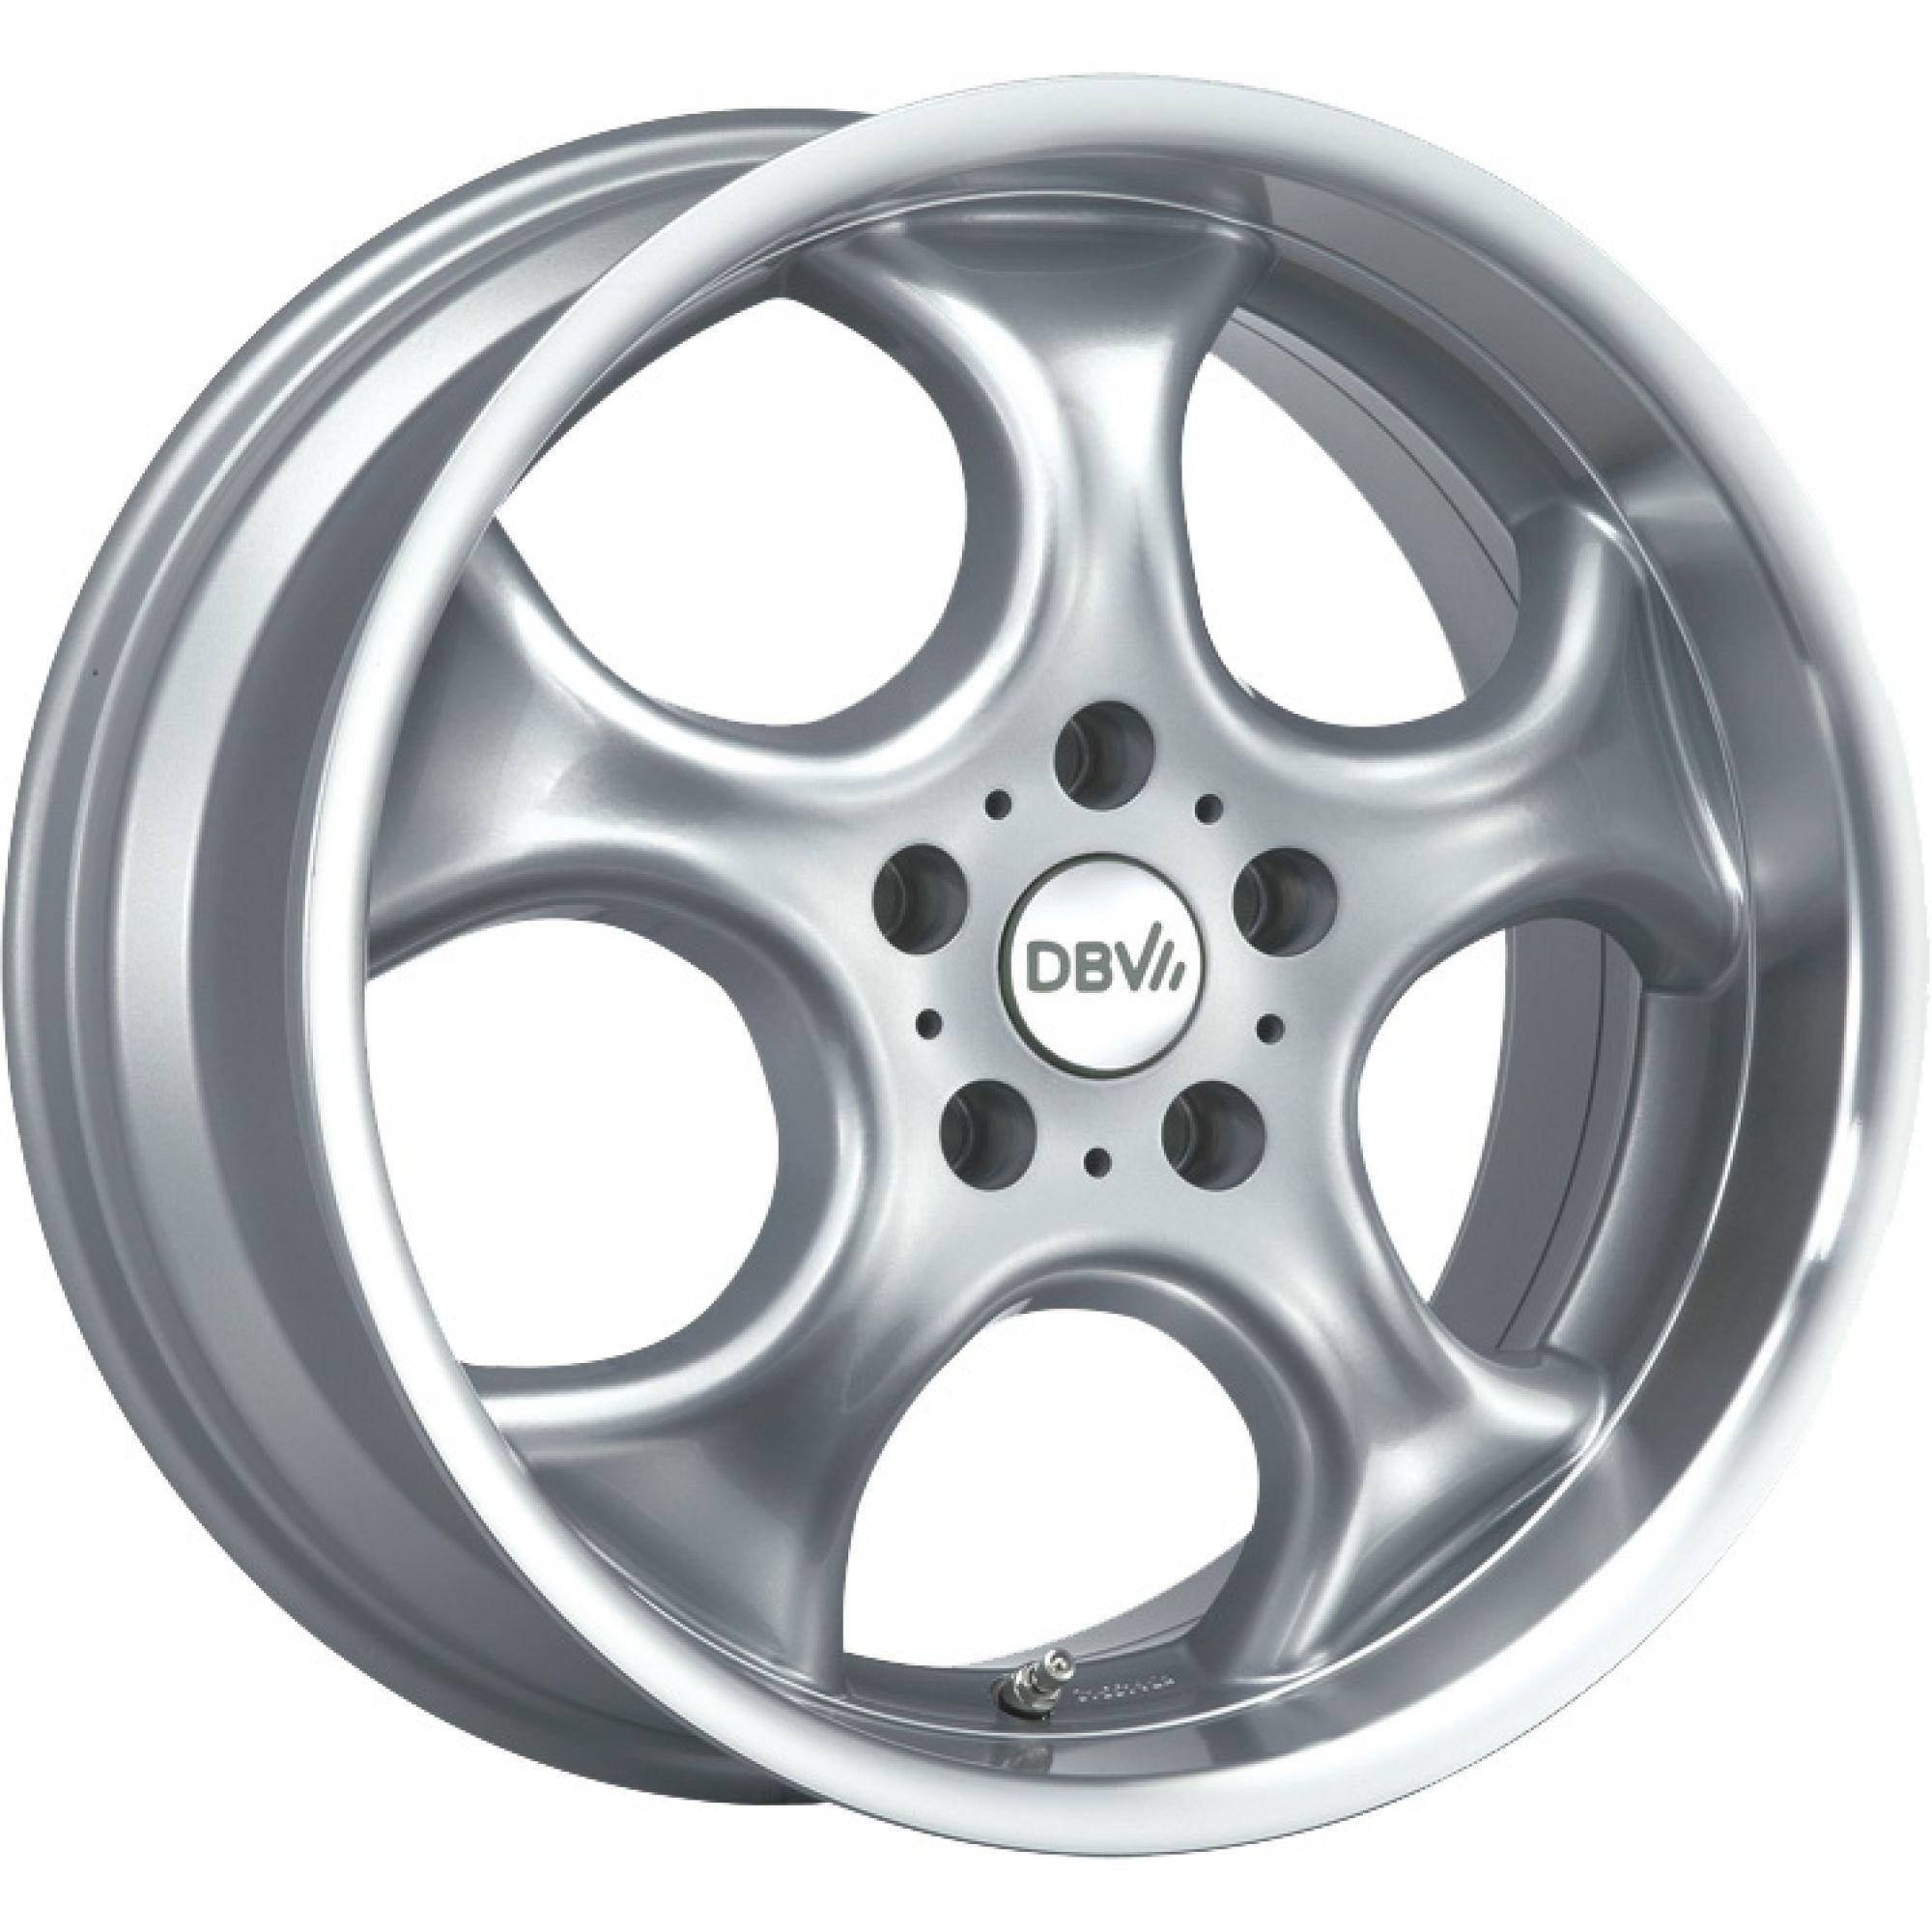 DBV Tahiti briljant zilver geschilderd lichtmetalen velg 5.5xR13 PCD 4x100 ET38 d63.30